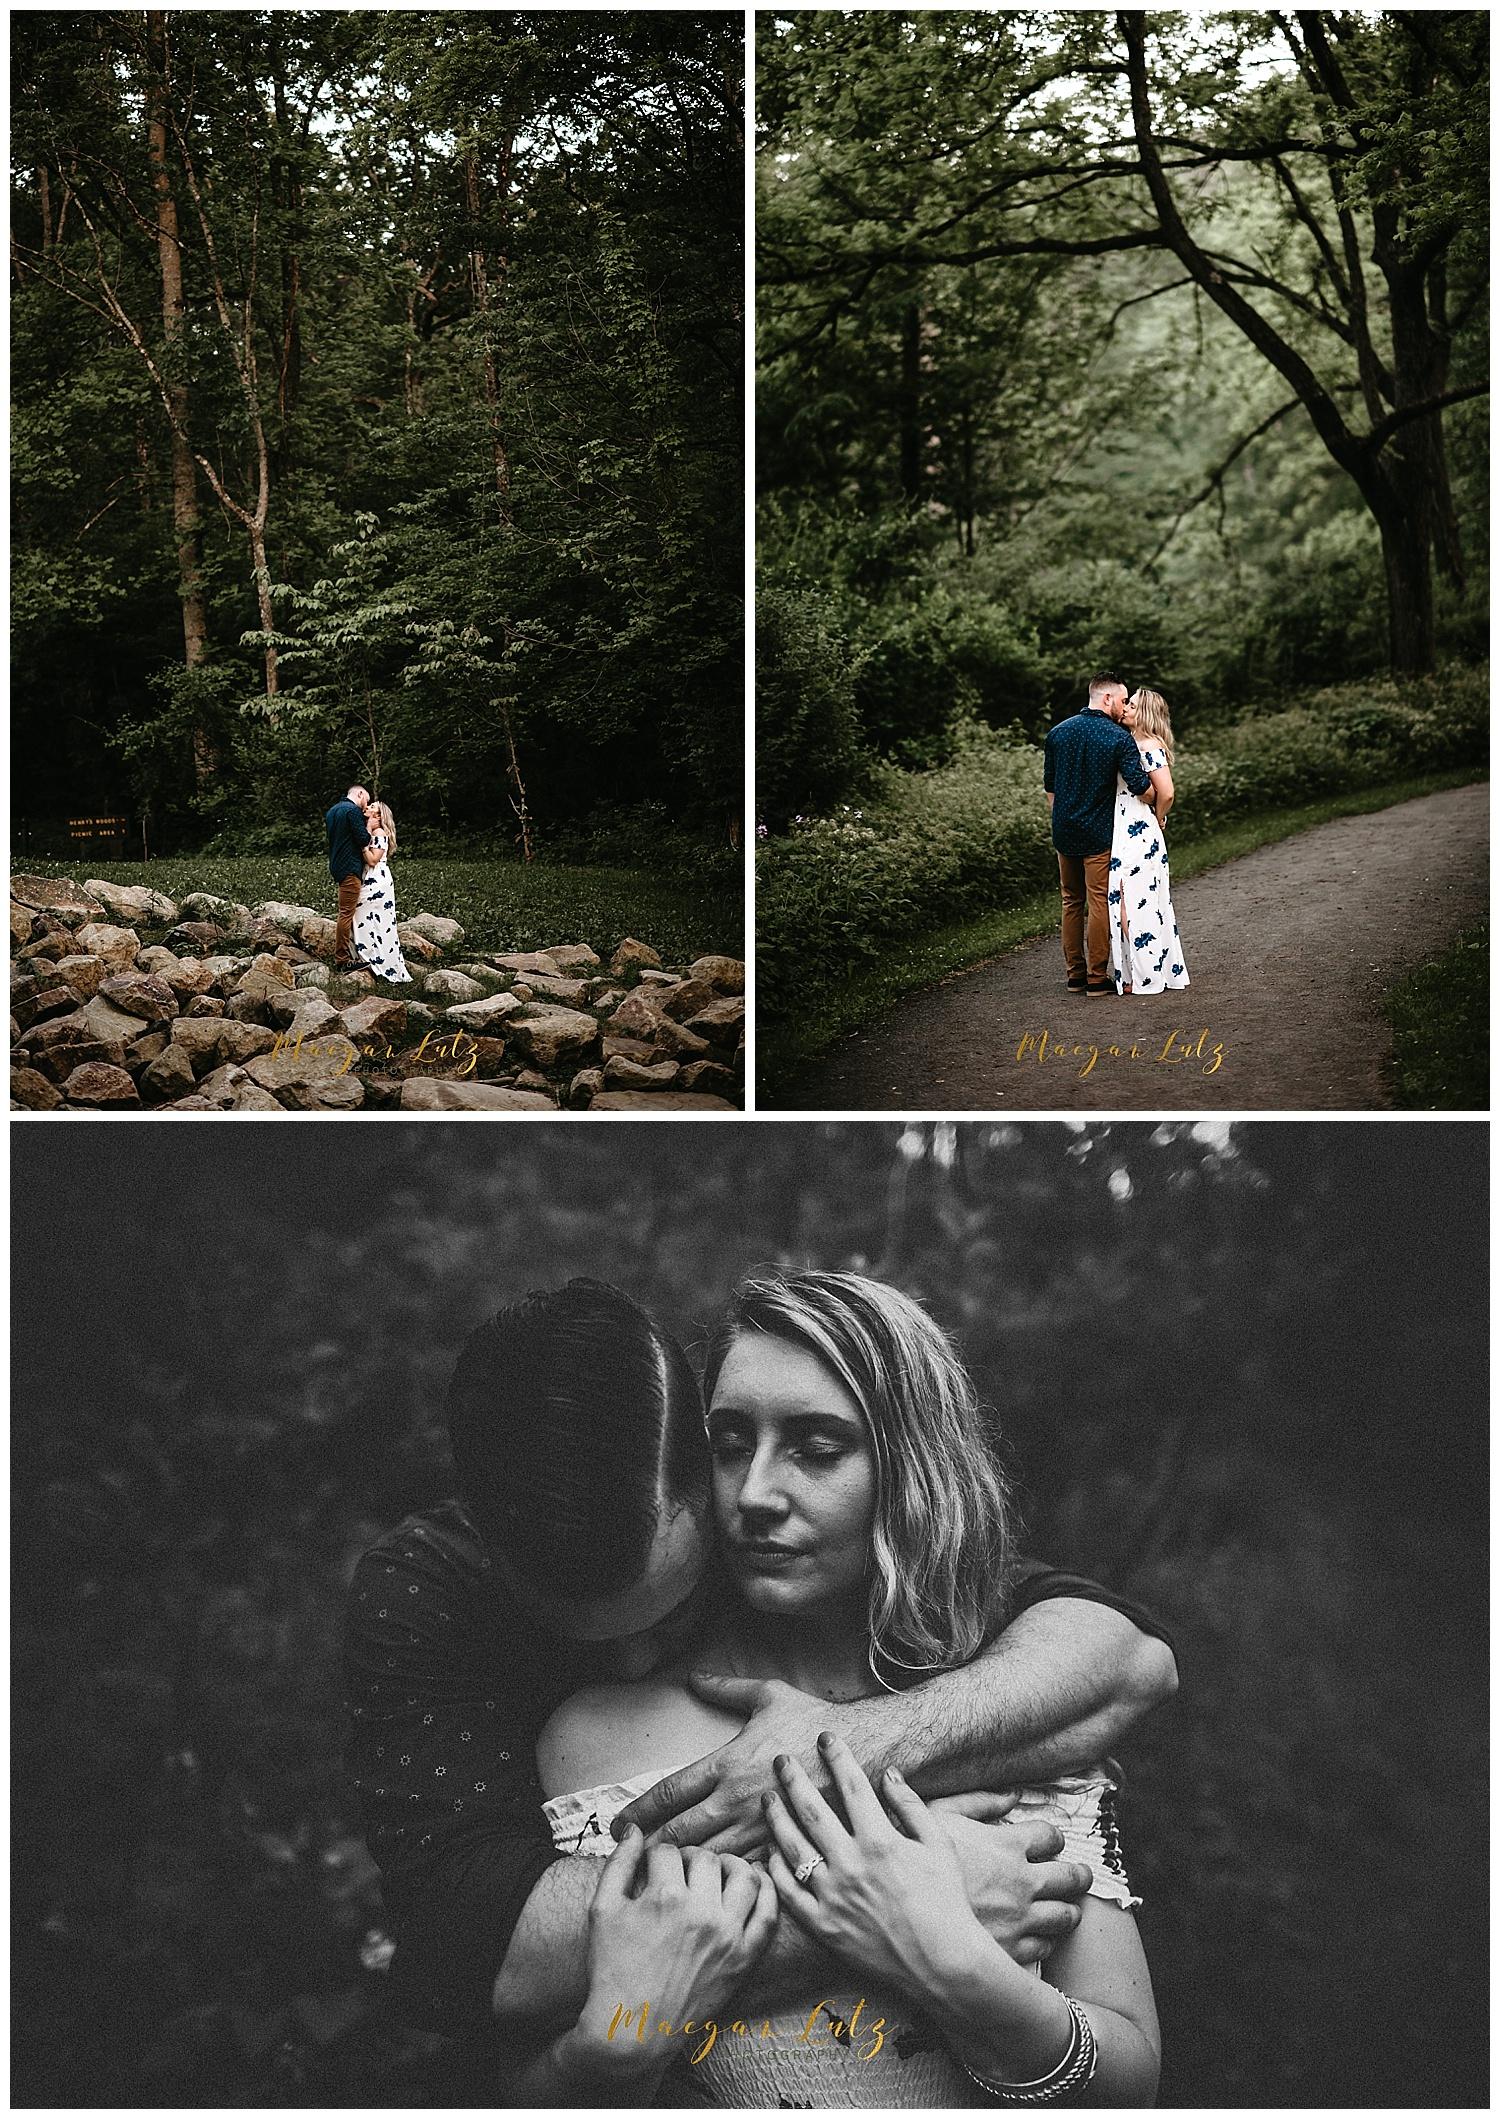 NEPA-wedding-engagement-photographer-Jacobsburg-state-park-Easton-PA_0052.jpg